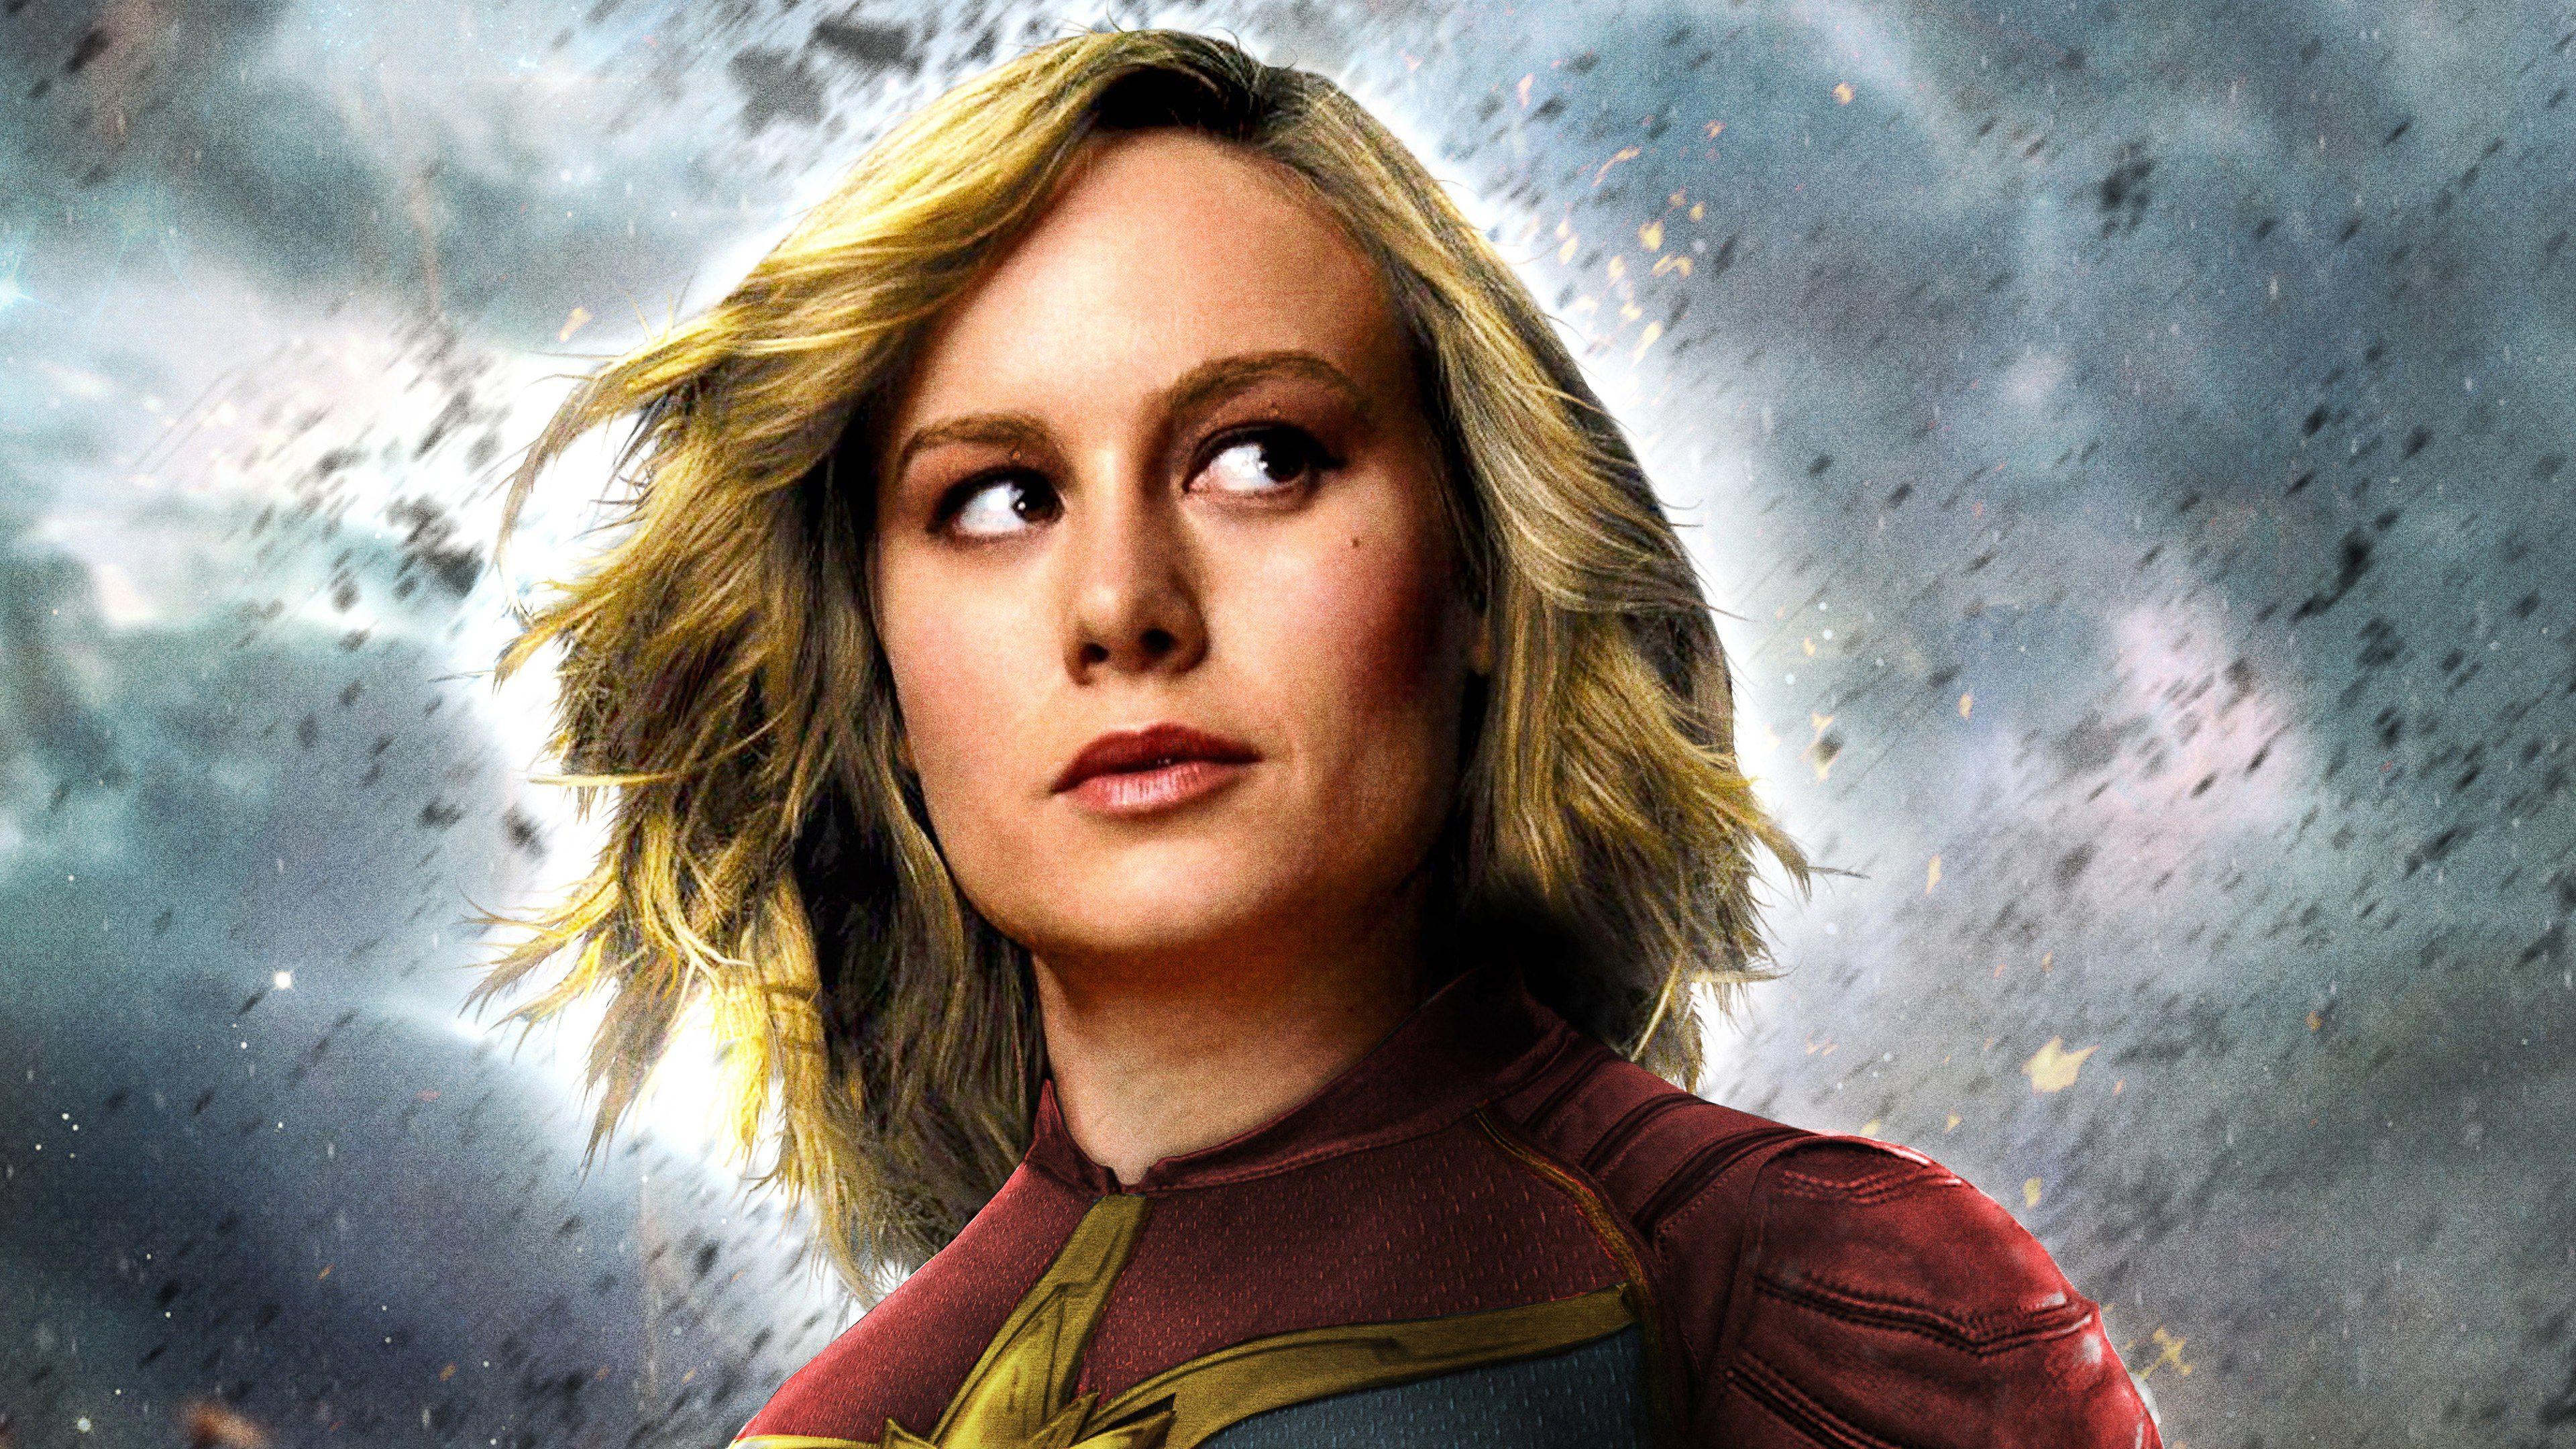 Captain Marvel Movie 2019 Brie Larson As Carol Danvers 4k Wallpaper Captain Marvel Movie 2019 Captain Marvel Captain Marvel Marvel 4k Captain Marvel Trailer